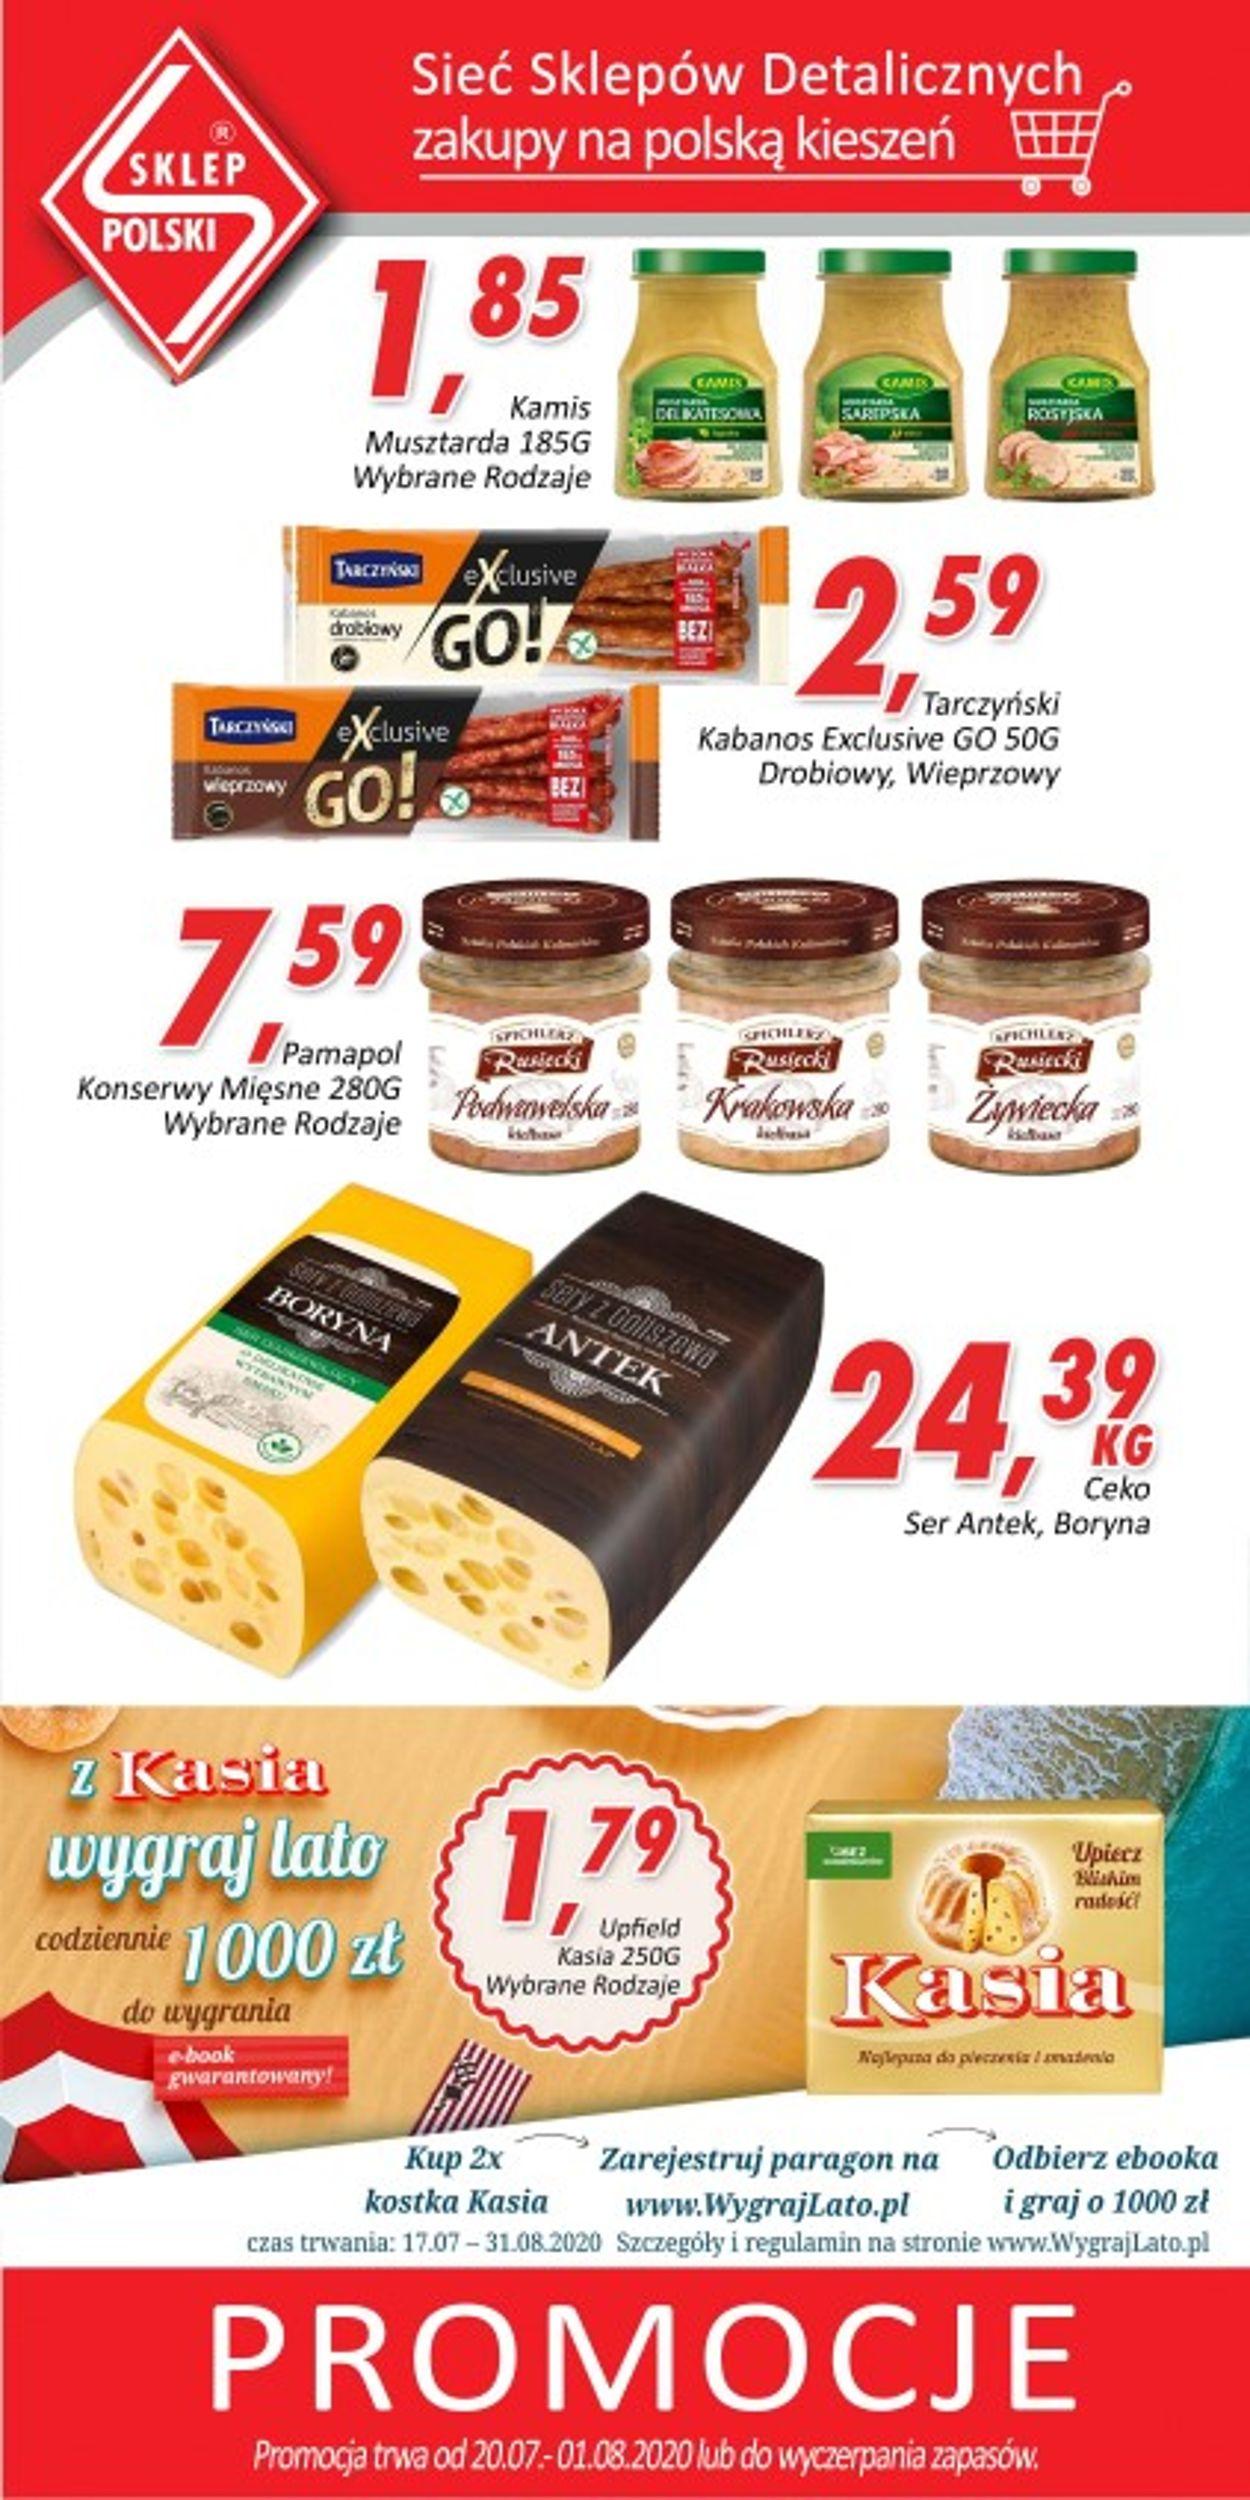 Gazetka promocyjna Sklep Polski - 20.07-01.08.2020